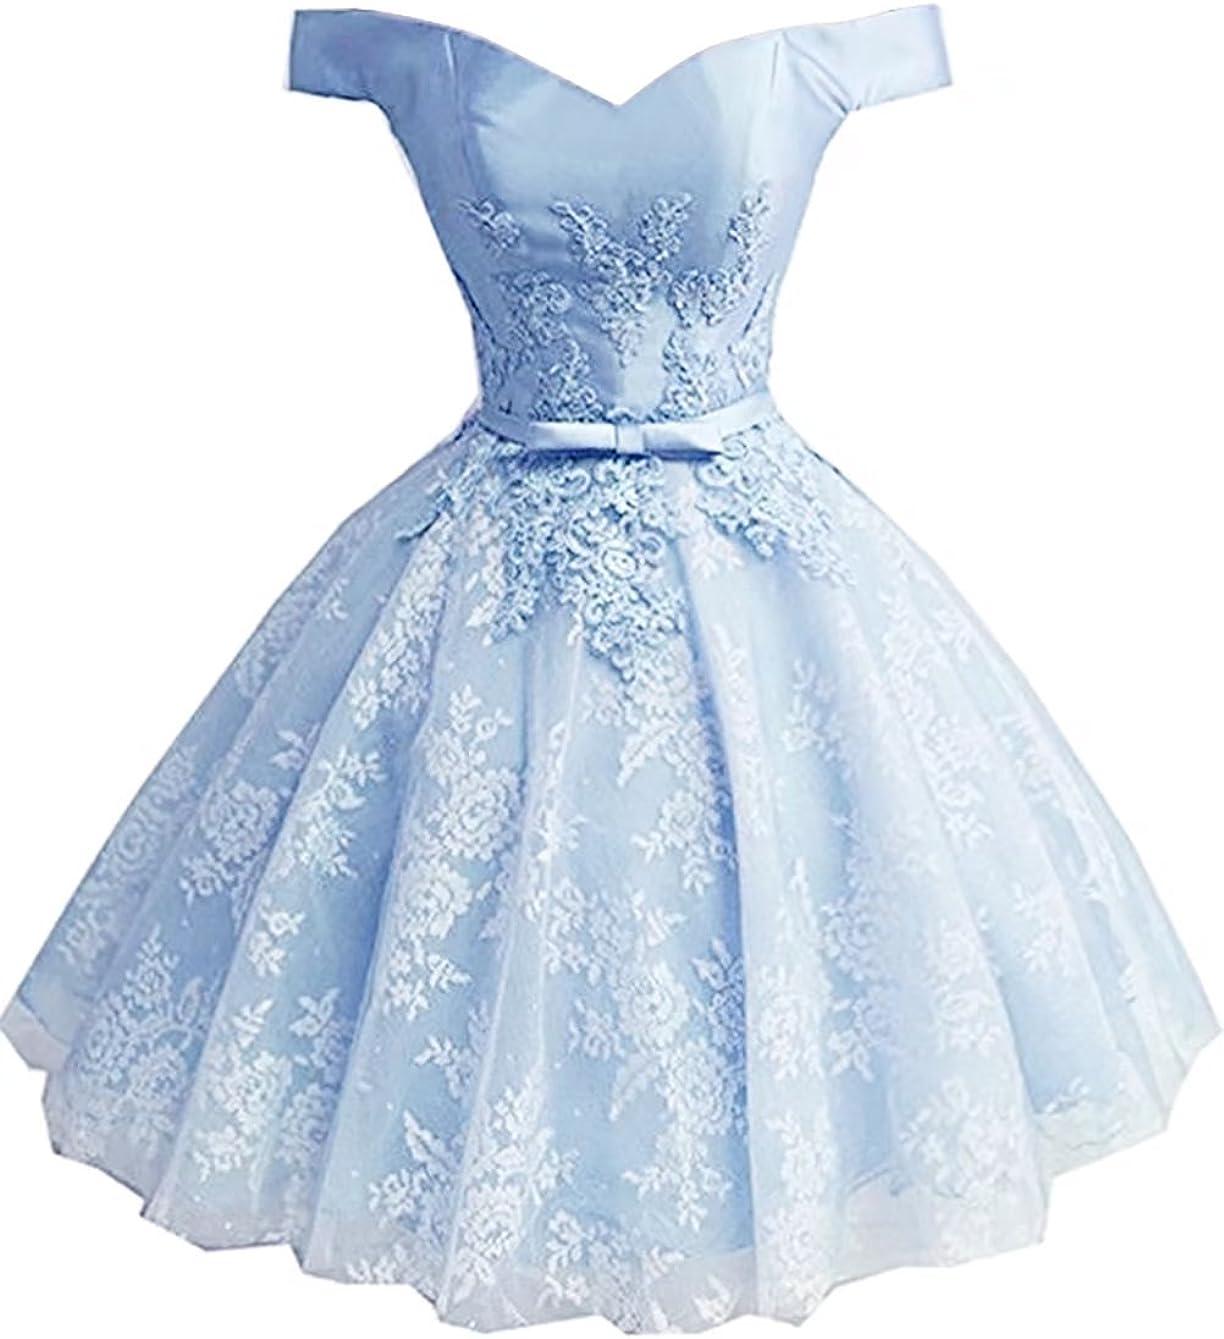 AiniDress Princesses Off The Shoulder Short Prom Dresses Appliques Party Homecoming Dress